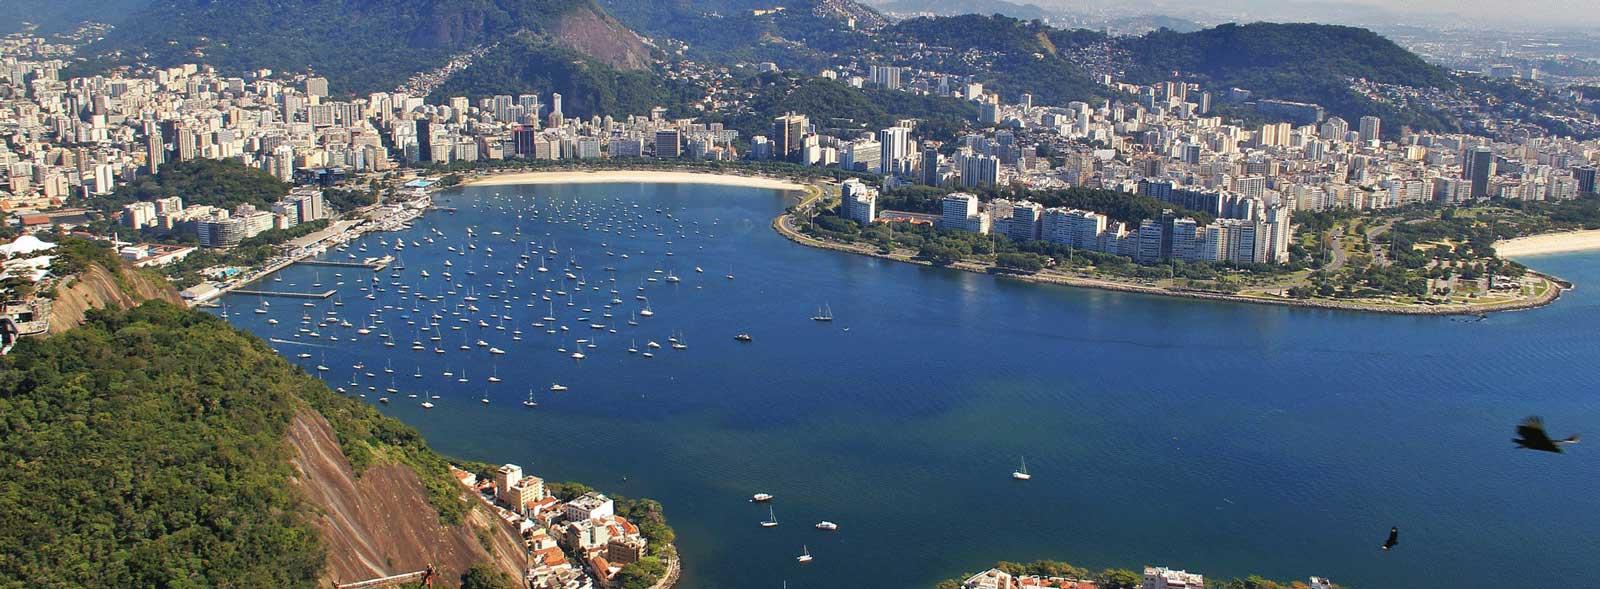 Volaway Rio de janeiro